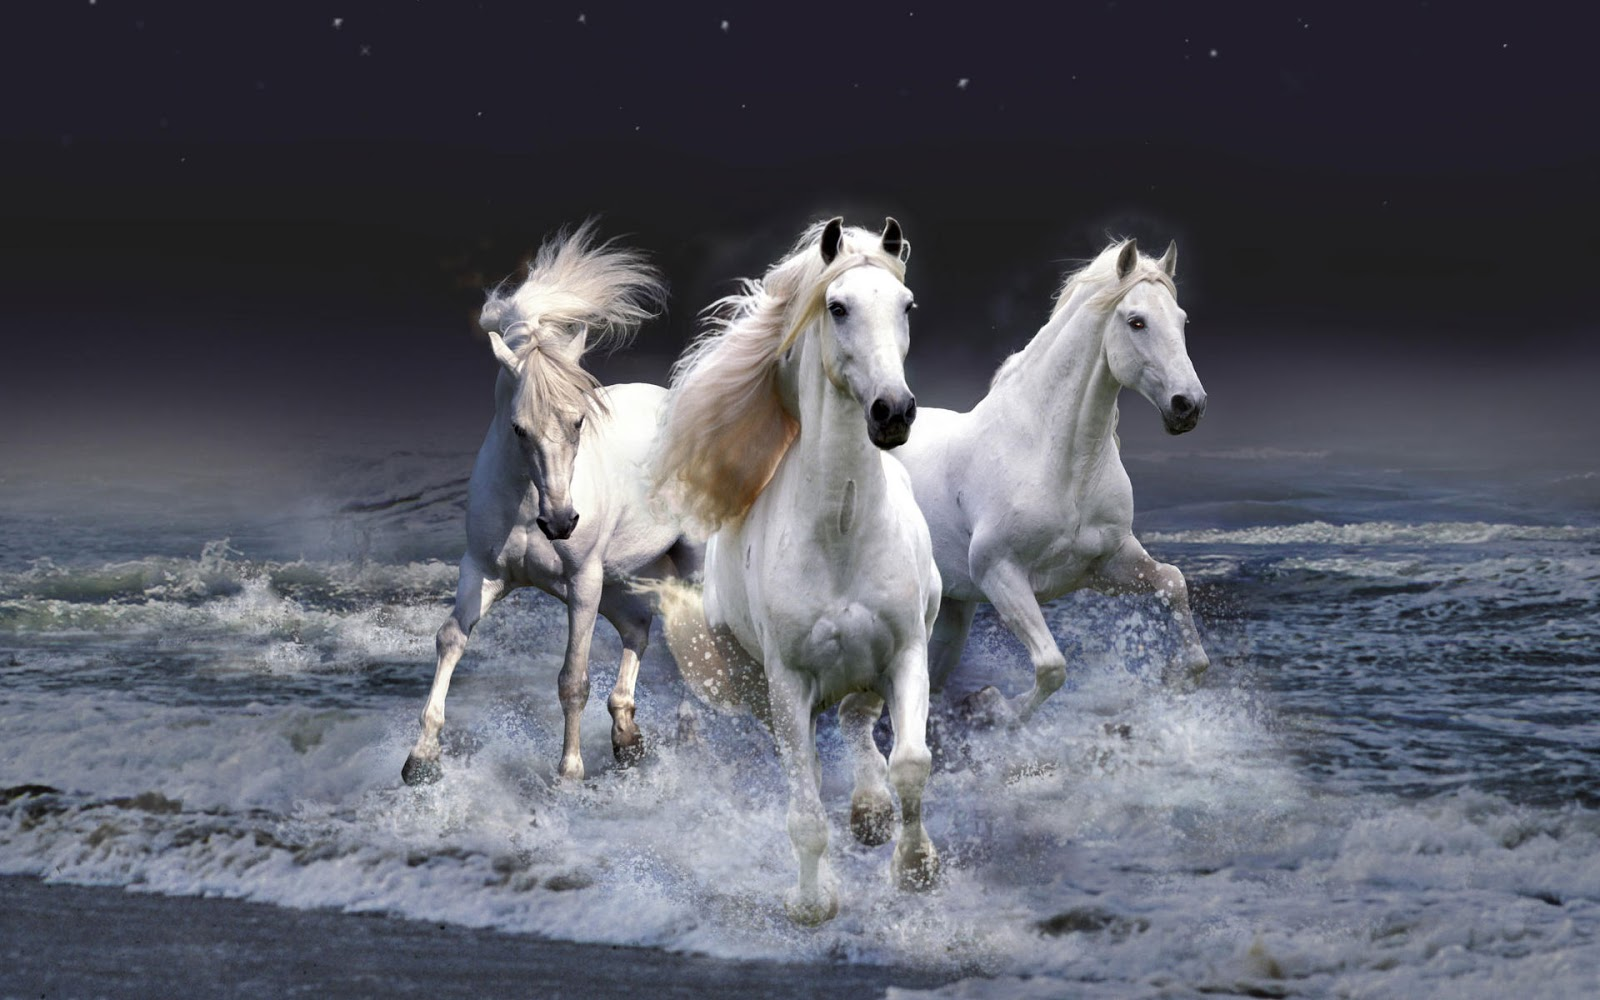 http://3.bp.blogspot.com/-HiH2A3smxTg/ULvDFXx2c_I/AAAAAAAAN7A/0juDTUVRO74/s1600/mystic_horses-wide.jpg